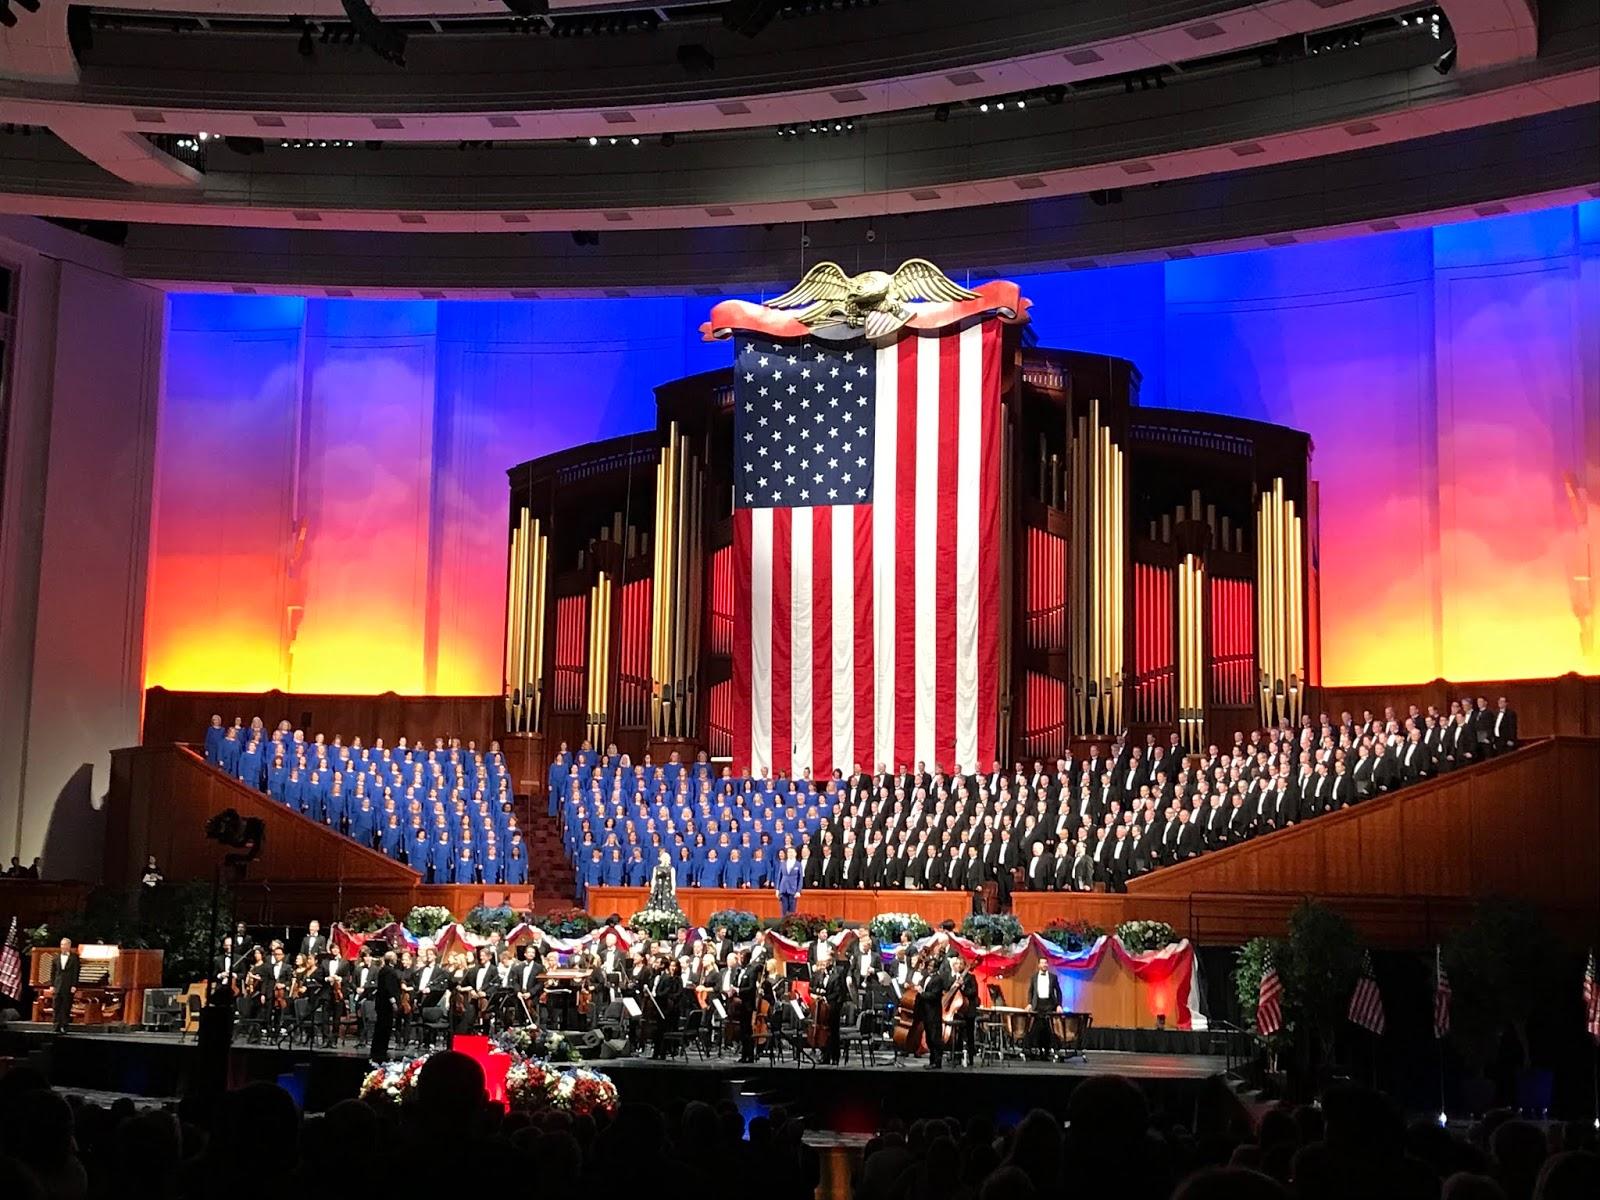 2019 Mormon Tabernacle Choir Christmas Concert Phaedra's Adventures: Mormon Tabernacle Choir